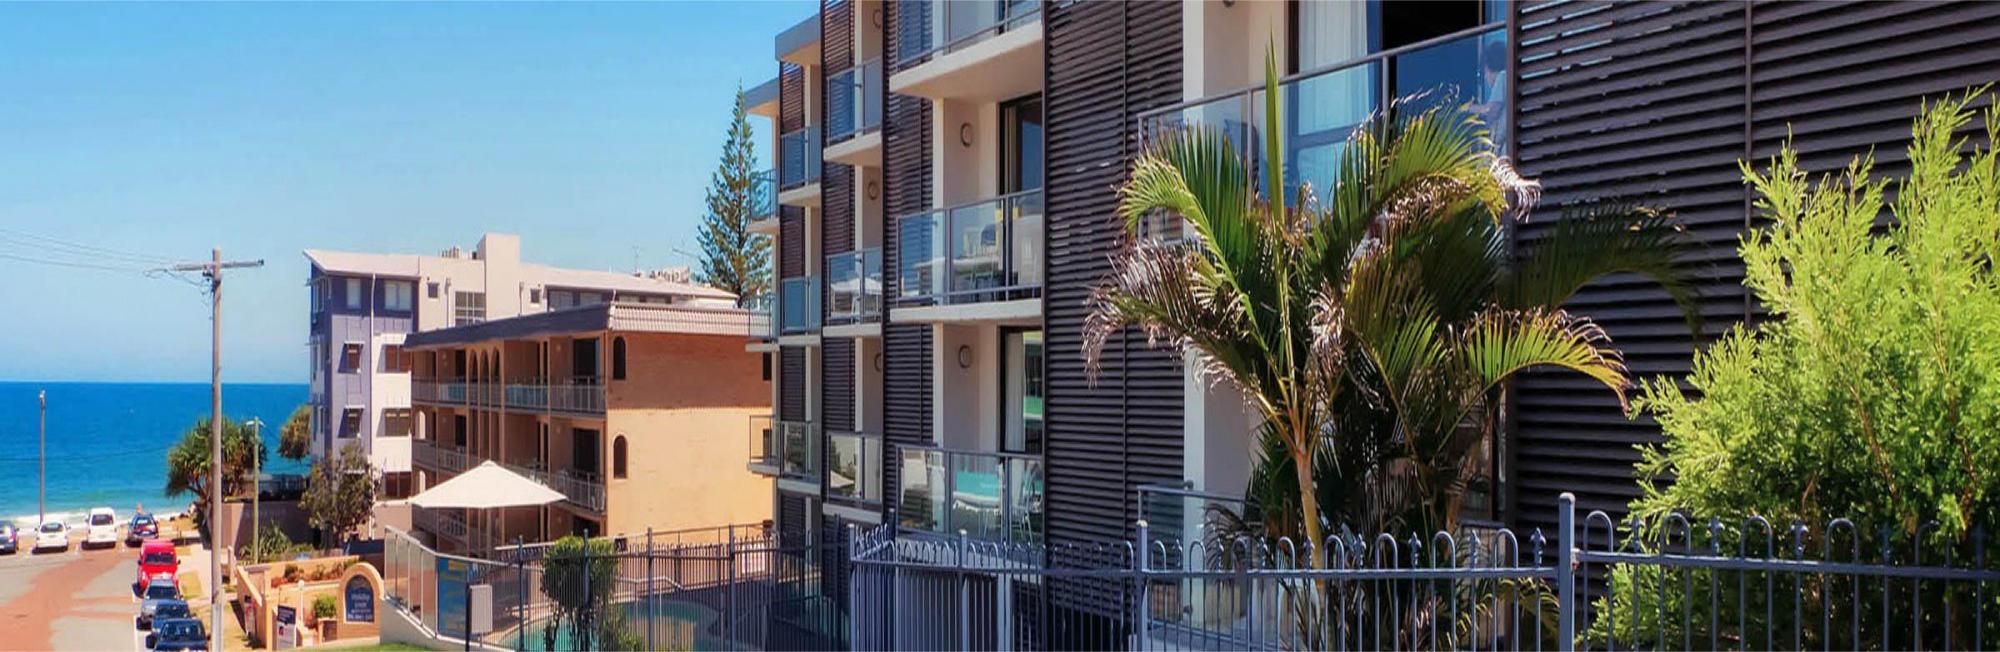 Caloundra Accommodation Kings Beach Apartments